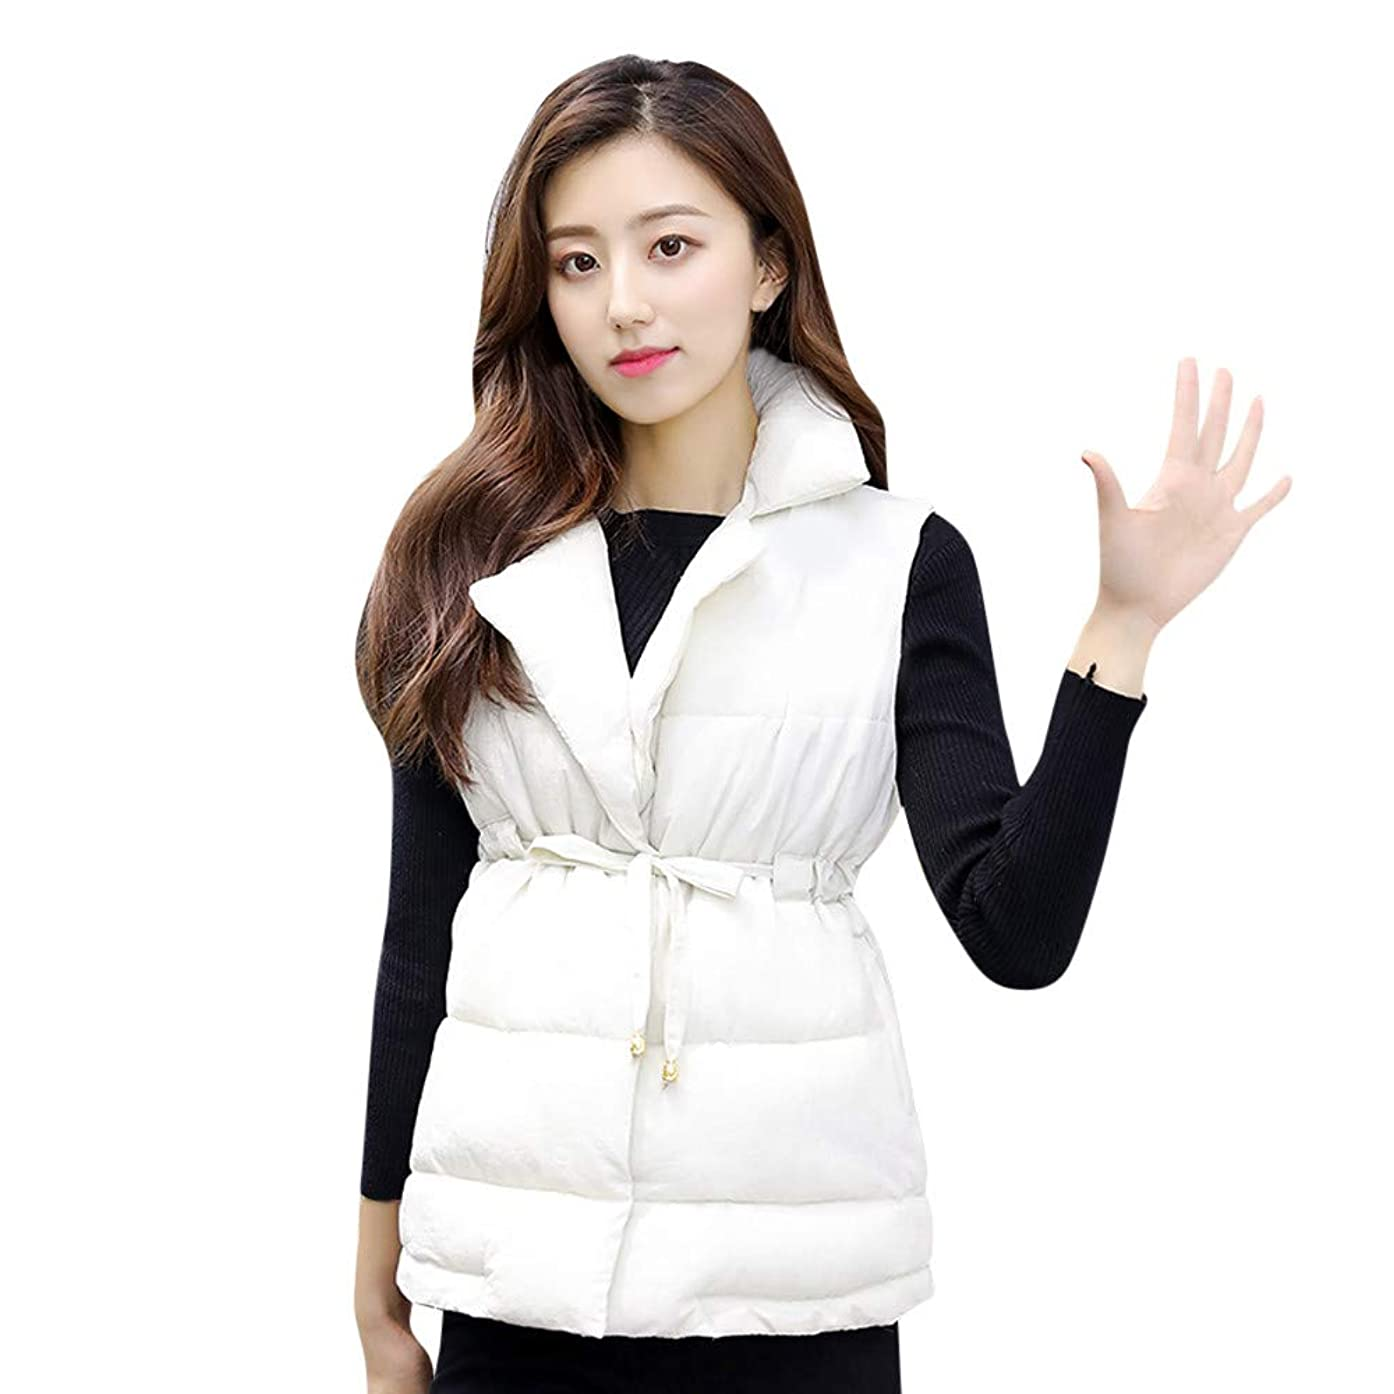 Usstore  Women's Sleeveless Short Slim Coat, Cotton-Padded Jackets Vest Pocket with Zip Jacket Coats